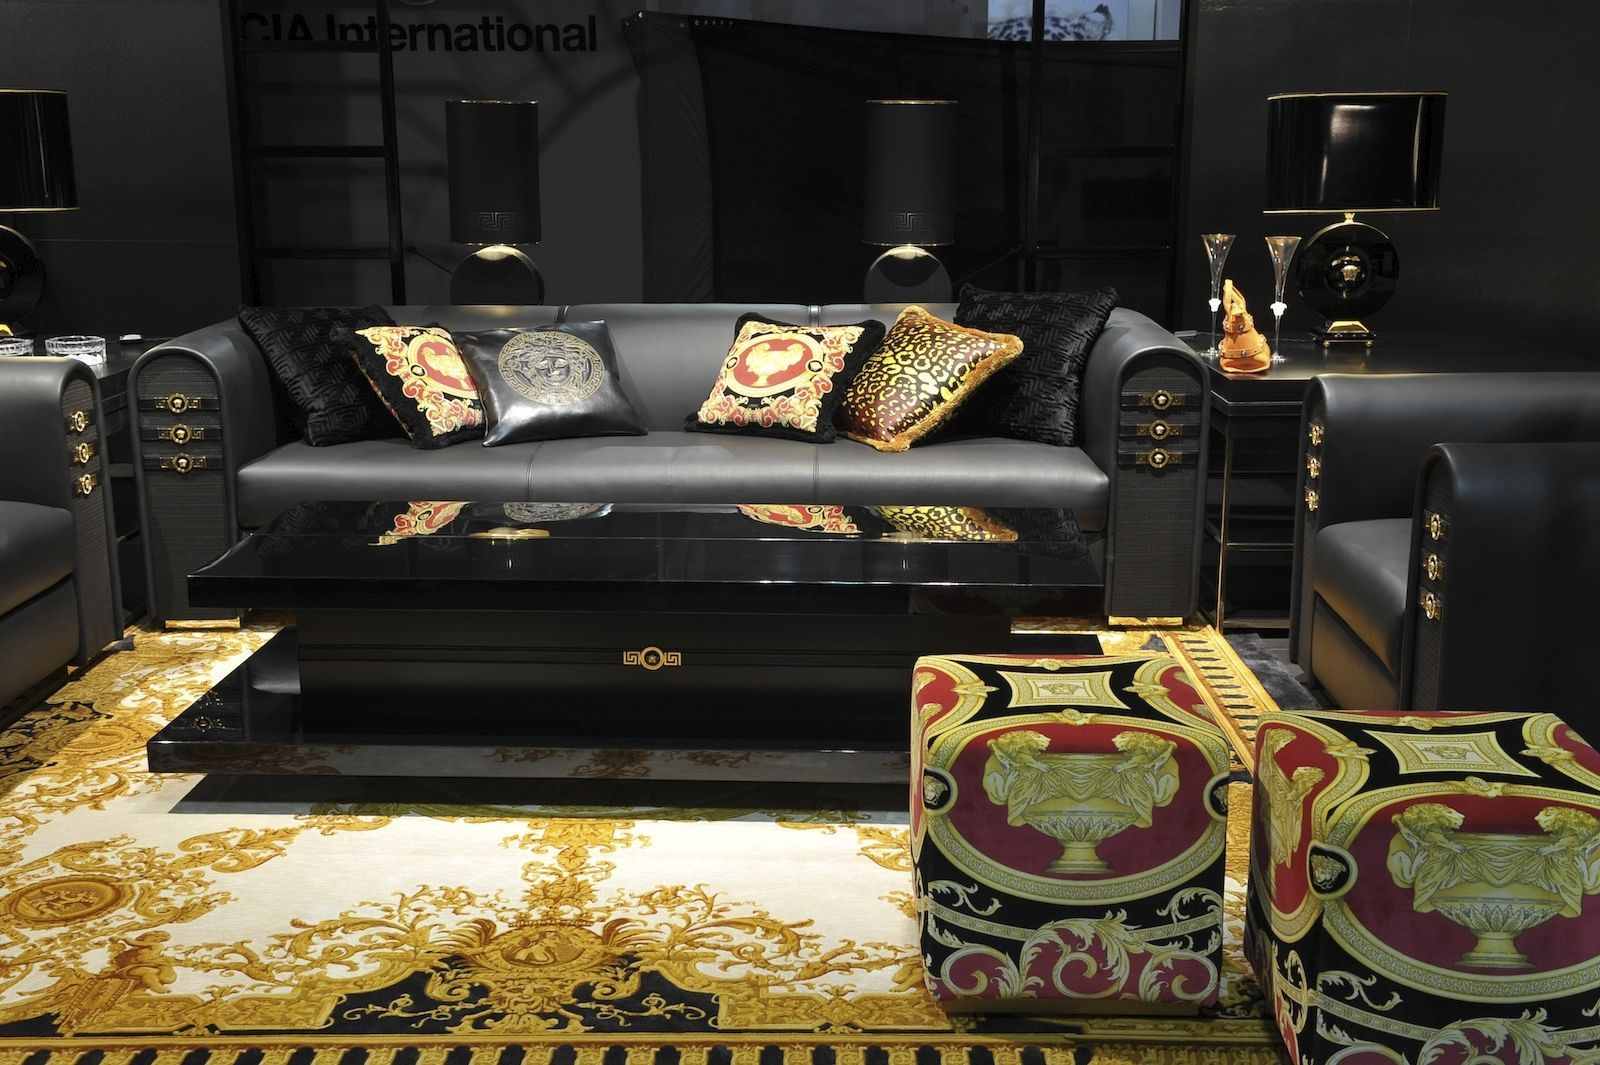 versace sofa dundee sofaworks phone number home collection 2014 image3120 via gesu